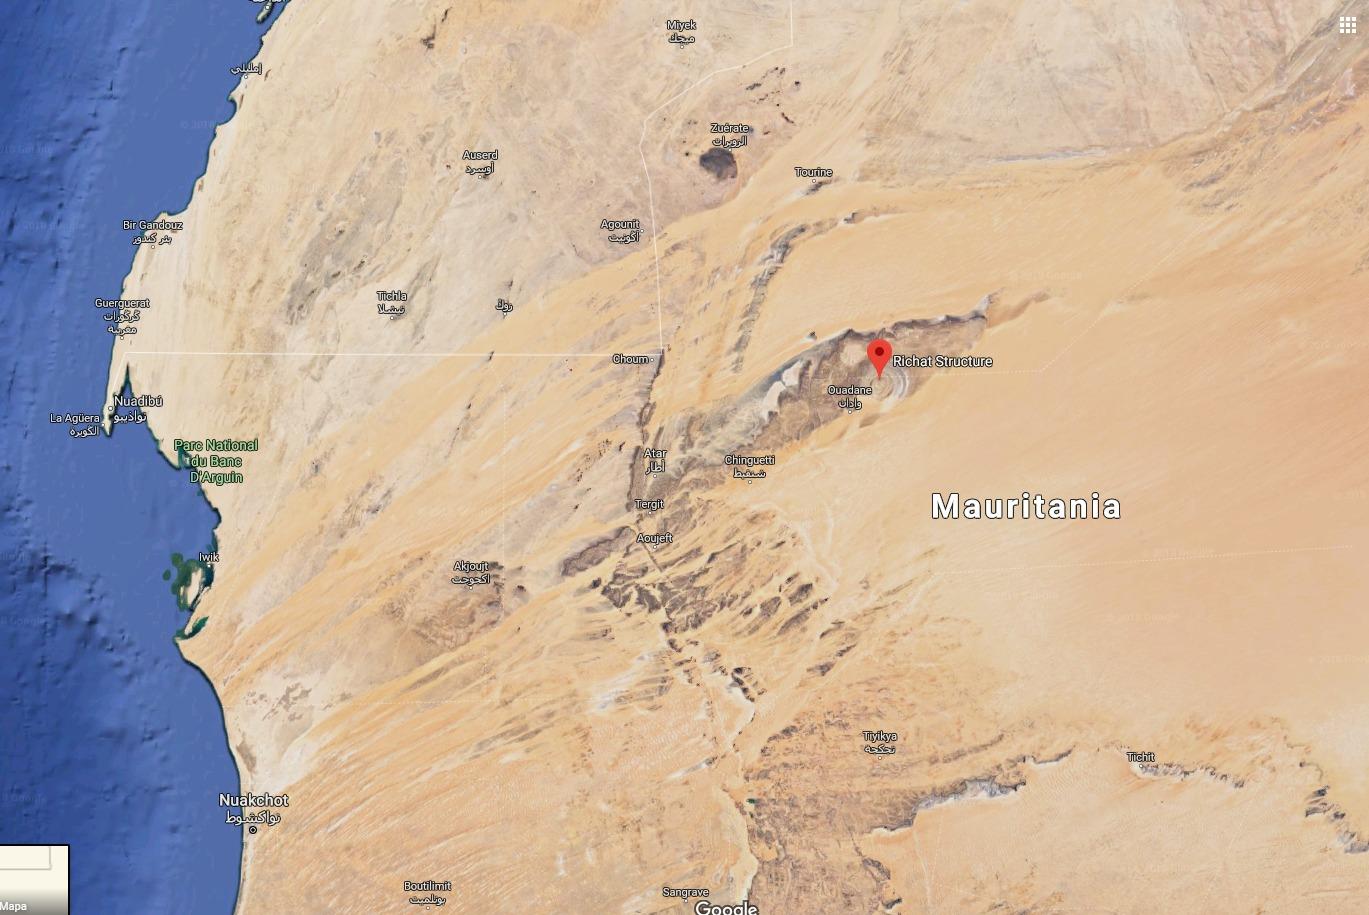 mauritania-0483bf21068e0634772b3d8d3936b7c3.jpg